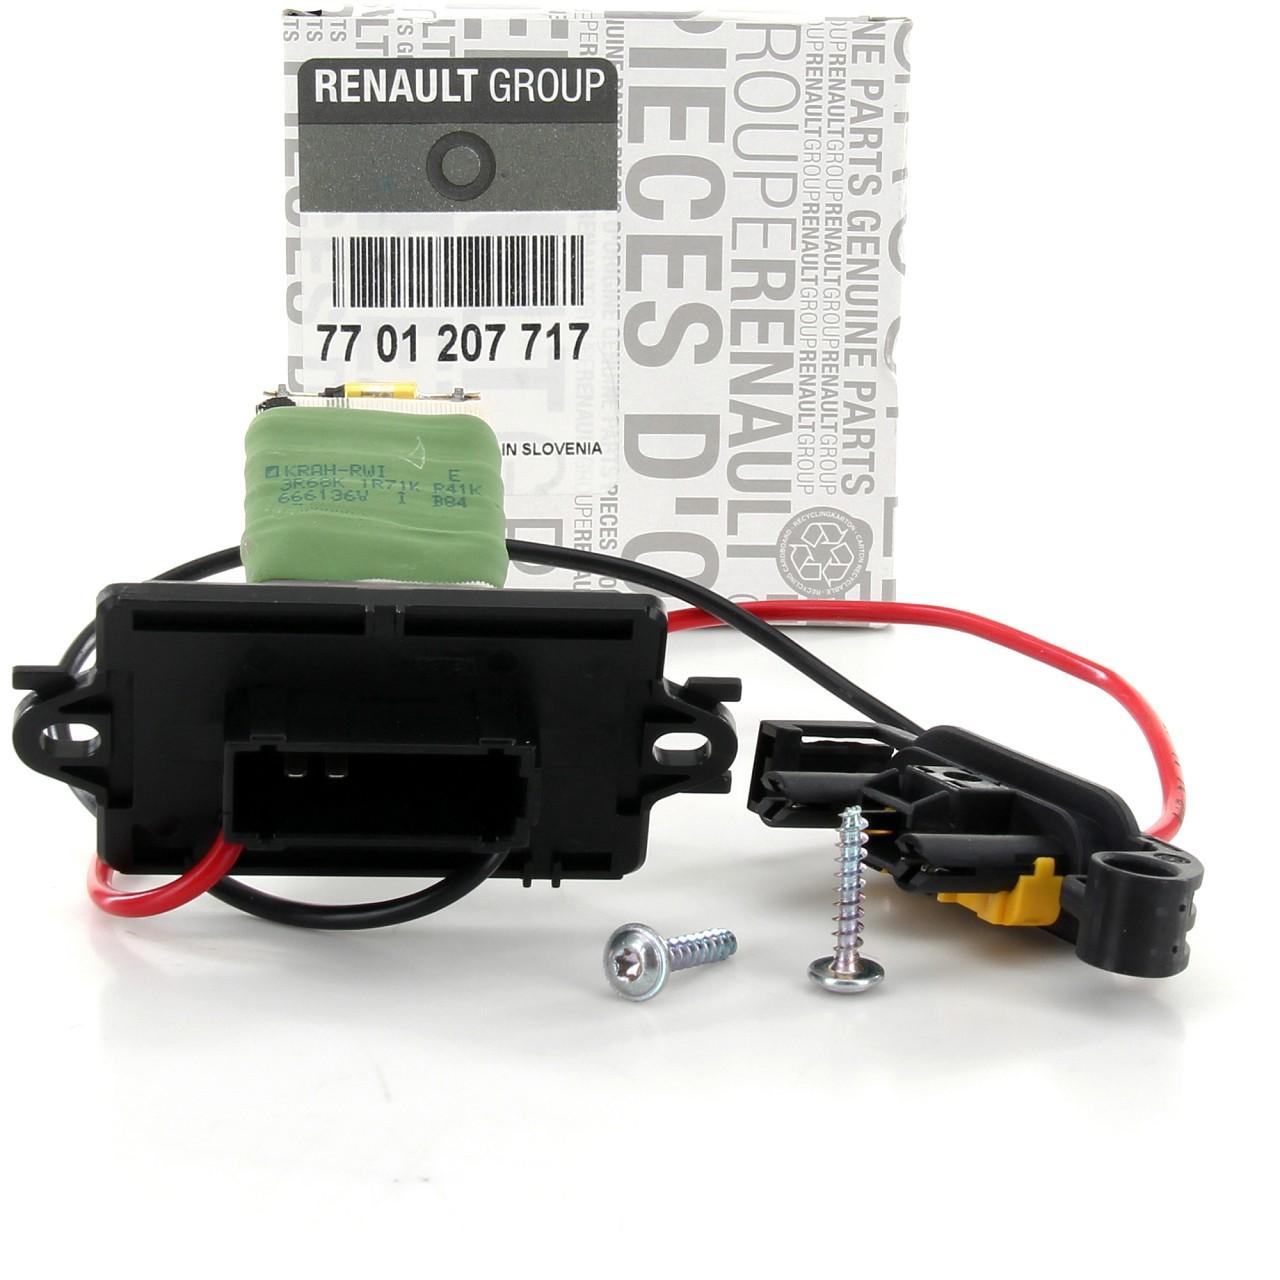 ORIGINAL Renault Widerstand Vorwiderstand Innenraumgebläse Megane II 7701207717